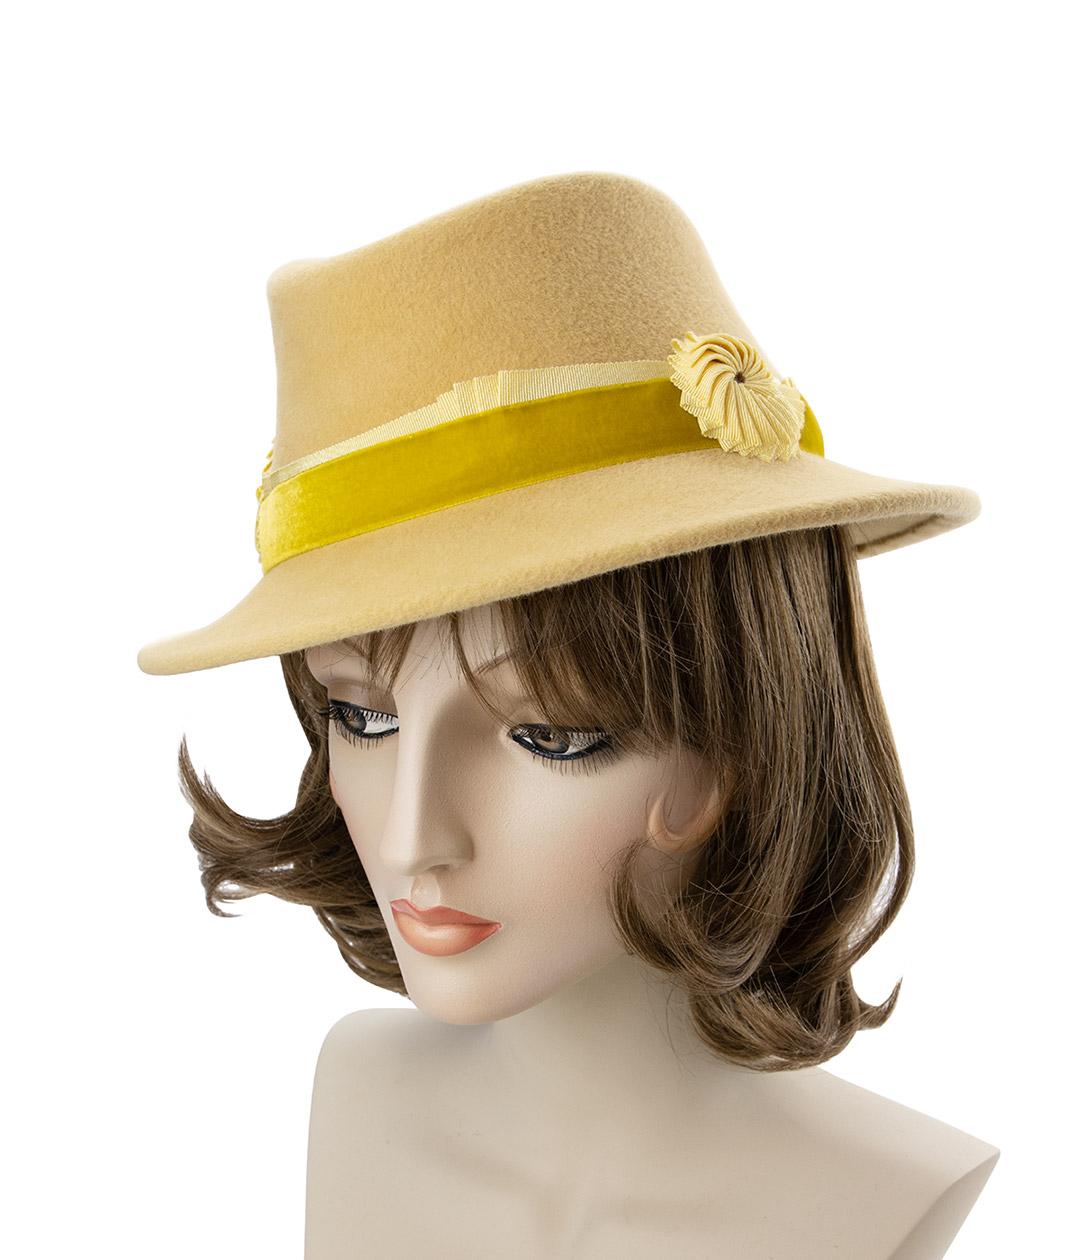 Women's vintage style hat